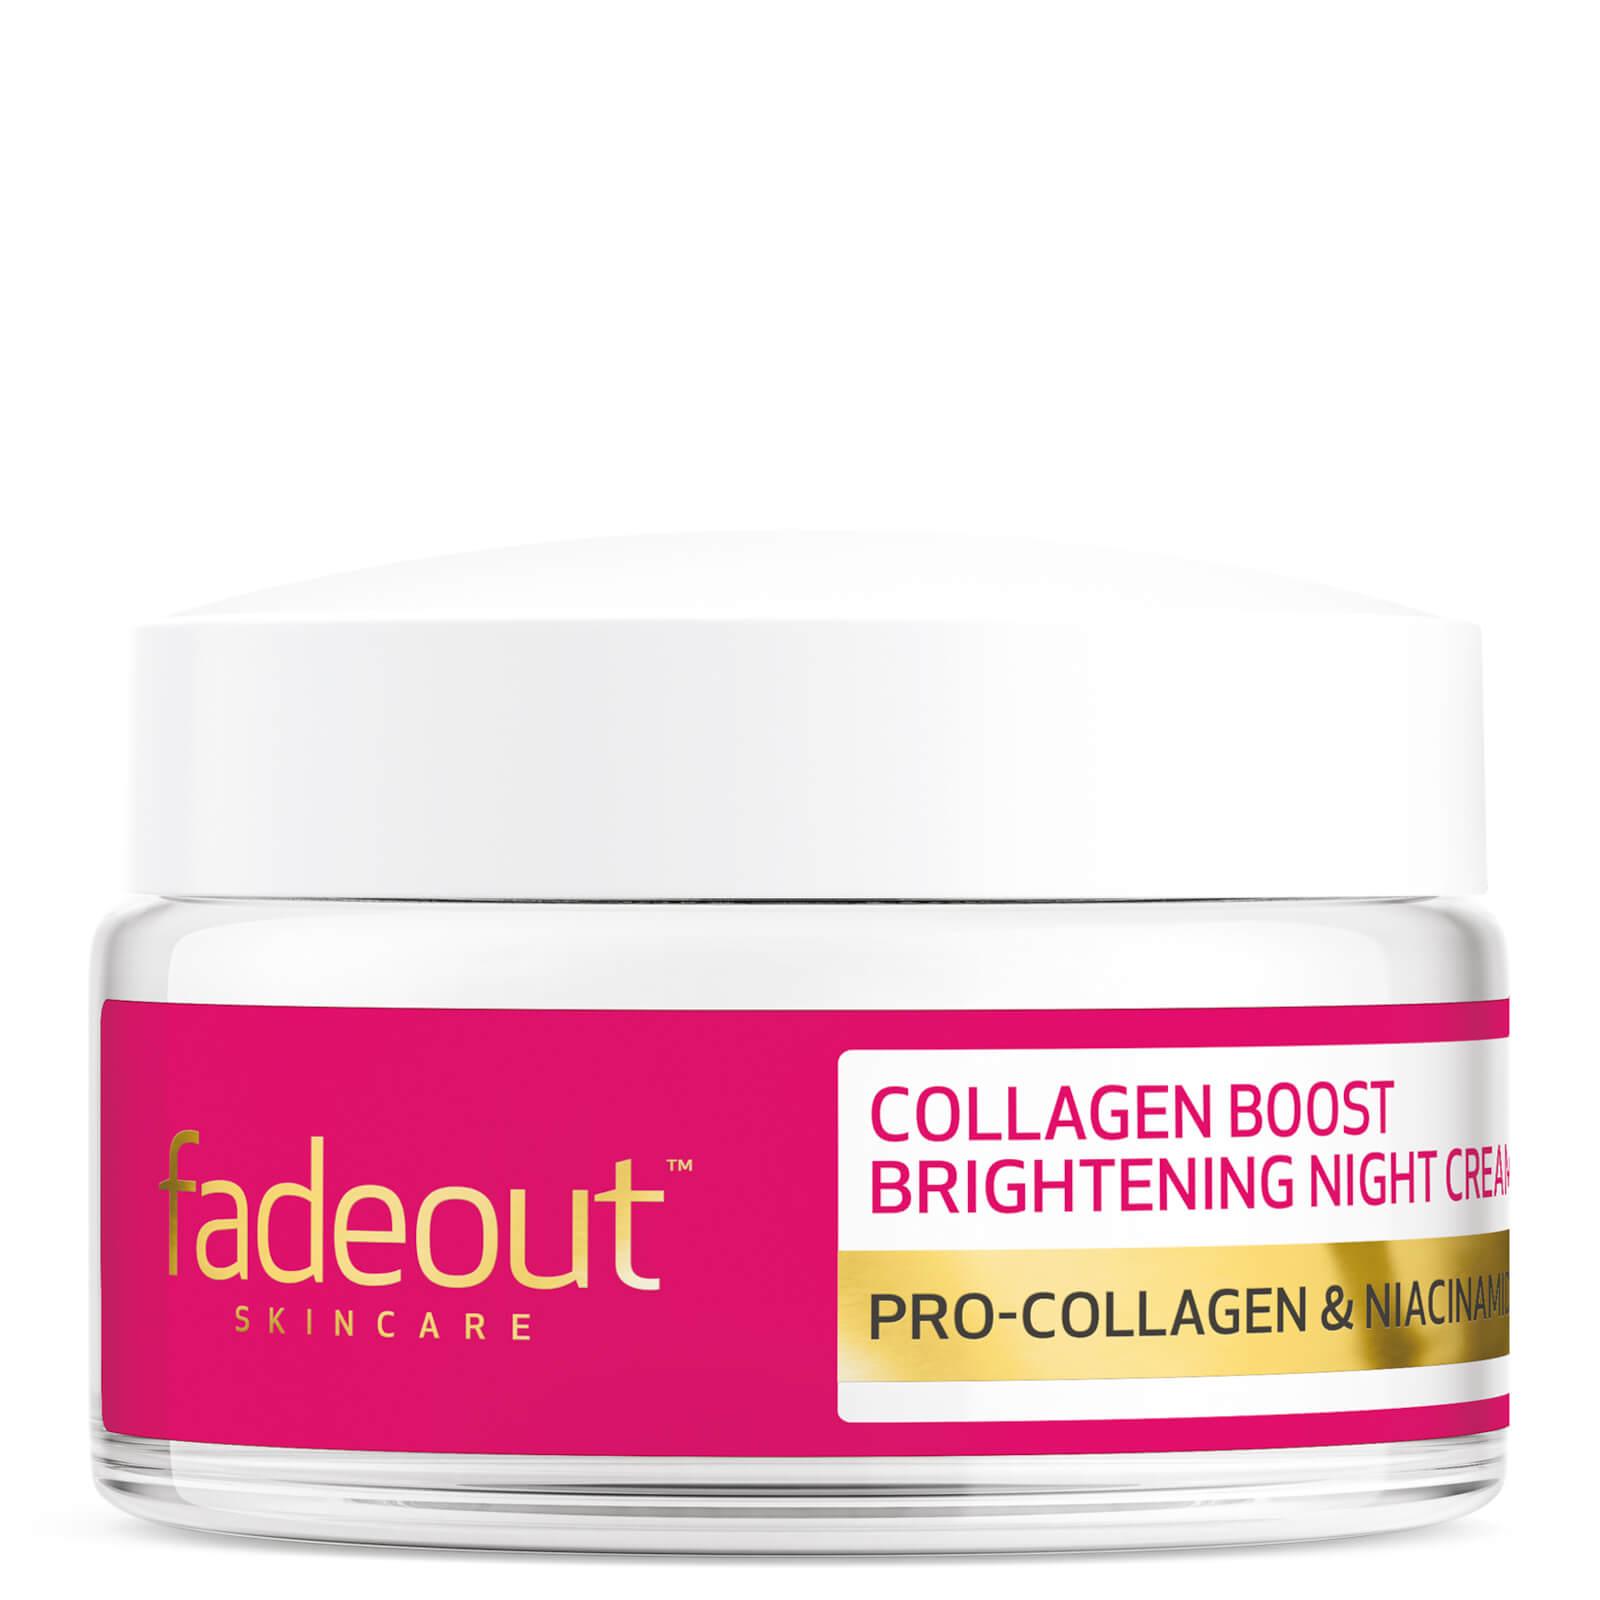 Купить Fade Out Collagen Boost Night Cream 50ml